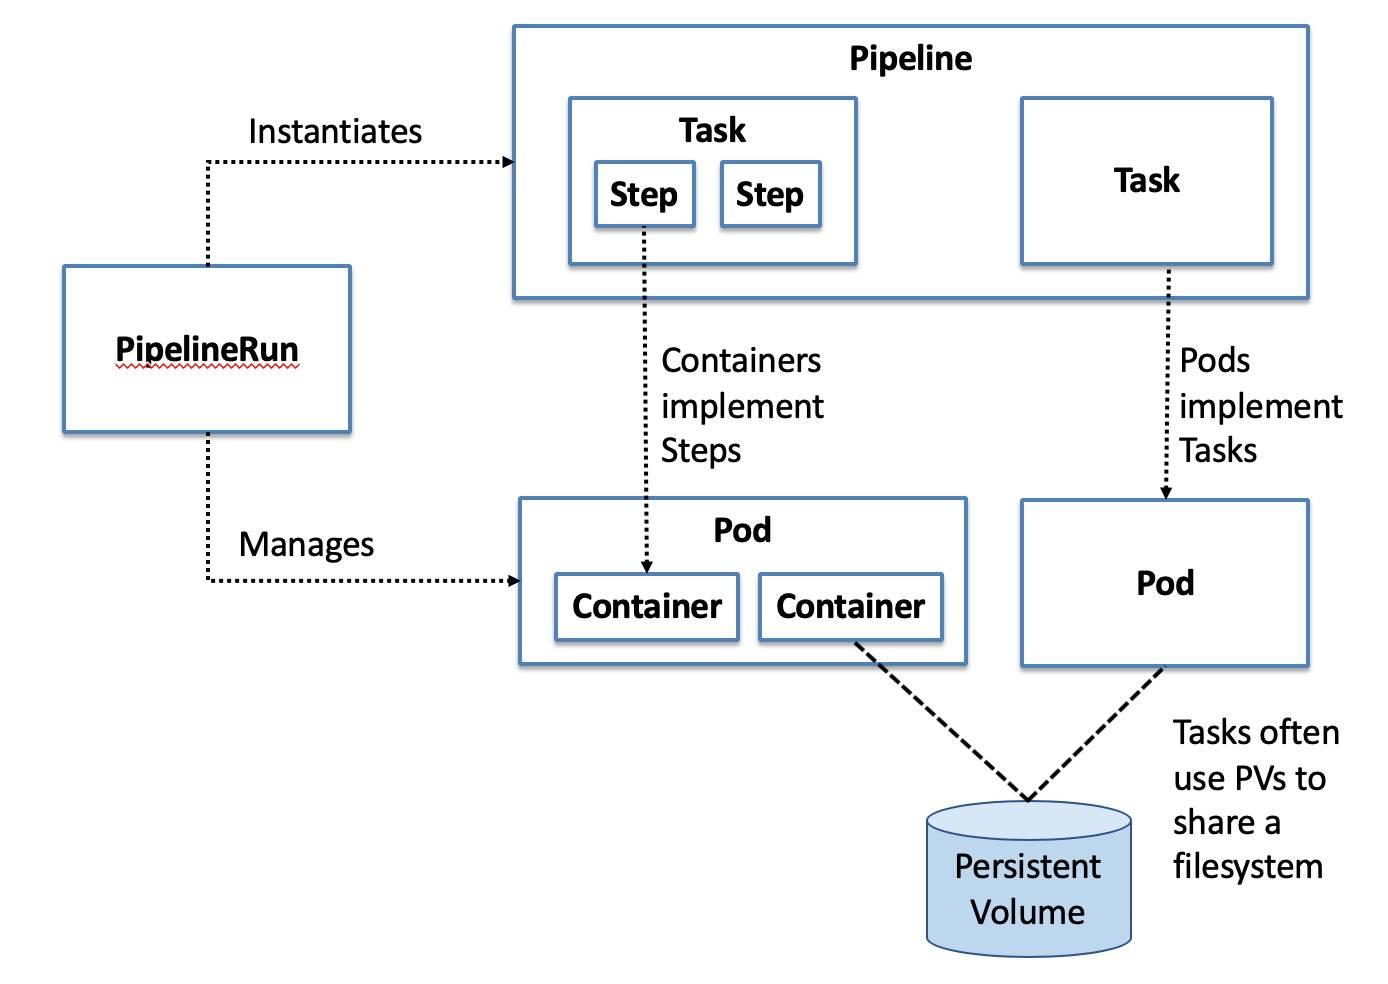 tekton - Kubernetes Deployment Tools to Improve Your Devops